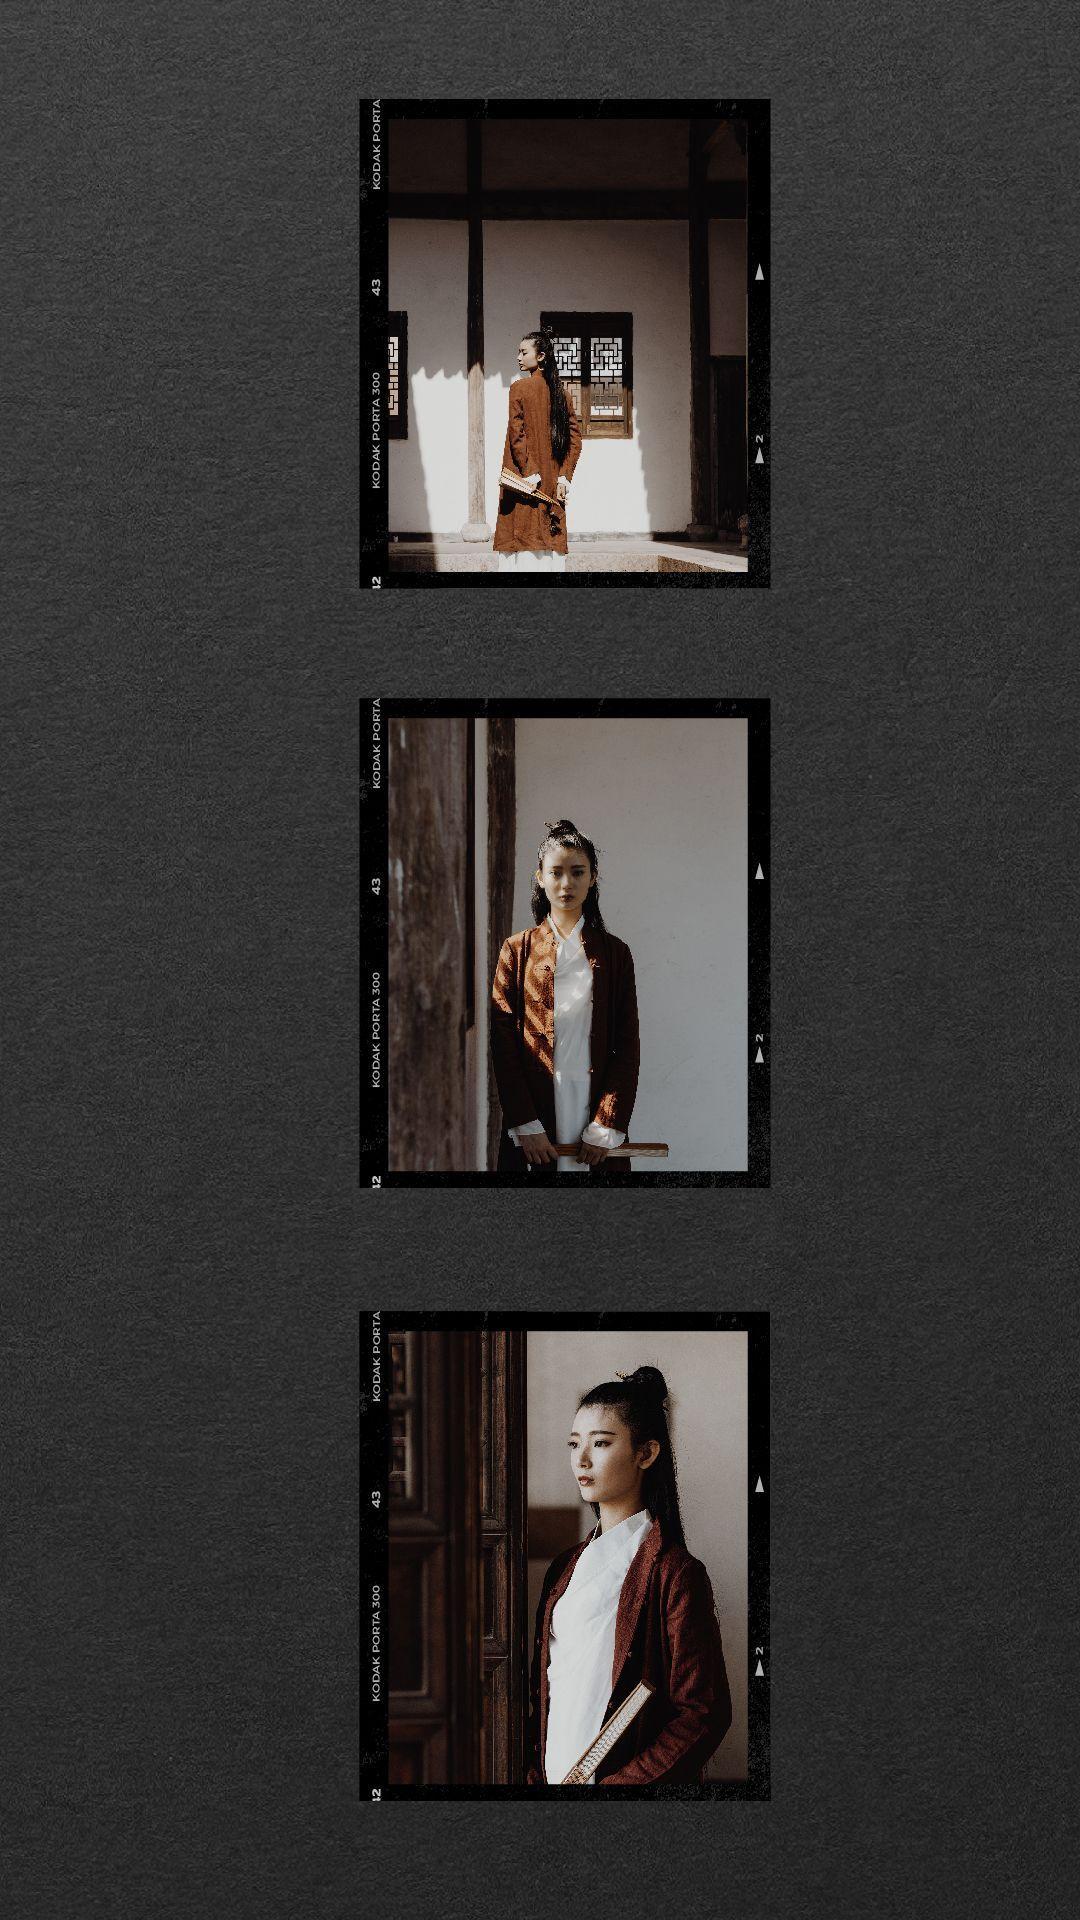 100 Film Frames Polaroid Instagram Stories Posts Unfold Stories Instagram St Film Frames Instagram Pola Fotografi Konseptual Trik Fotografi Fotografi